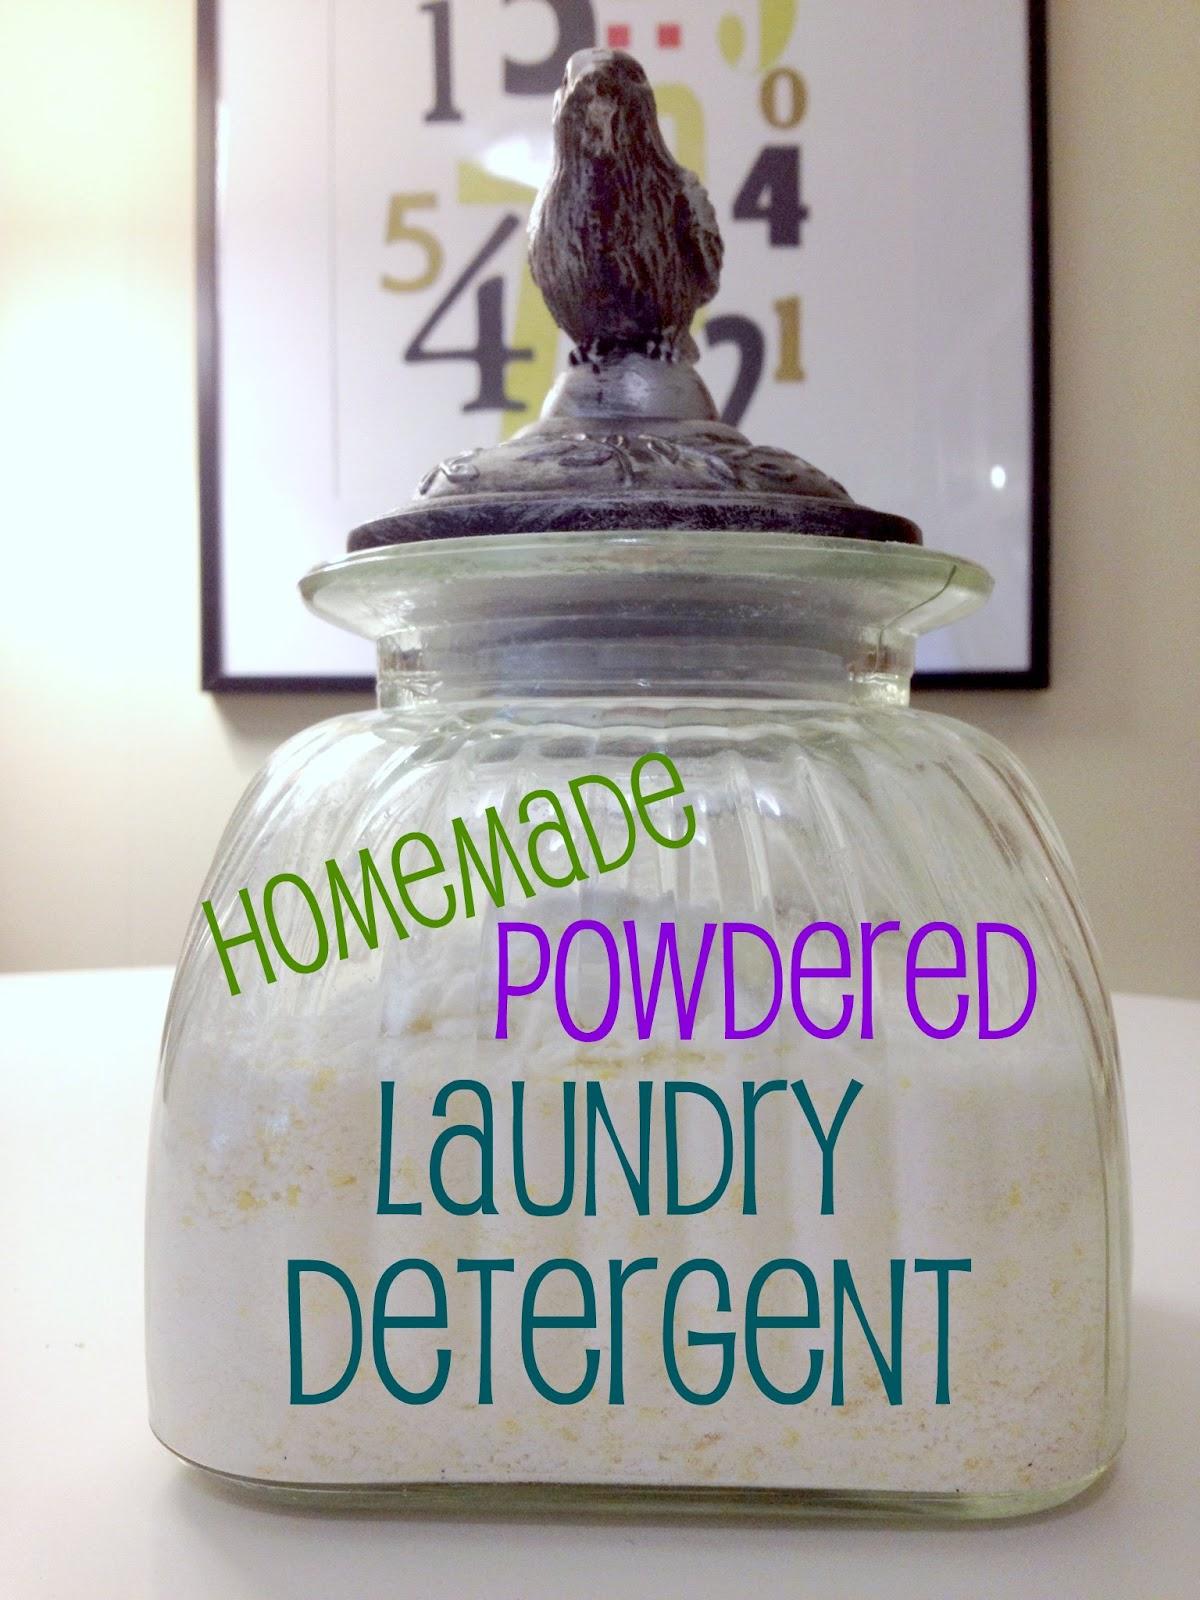 Homemade powdered laundry detergent car interior design